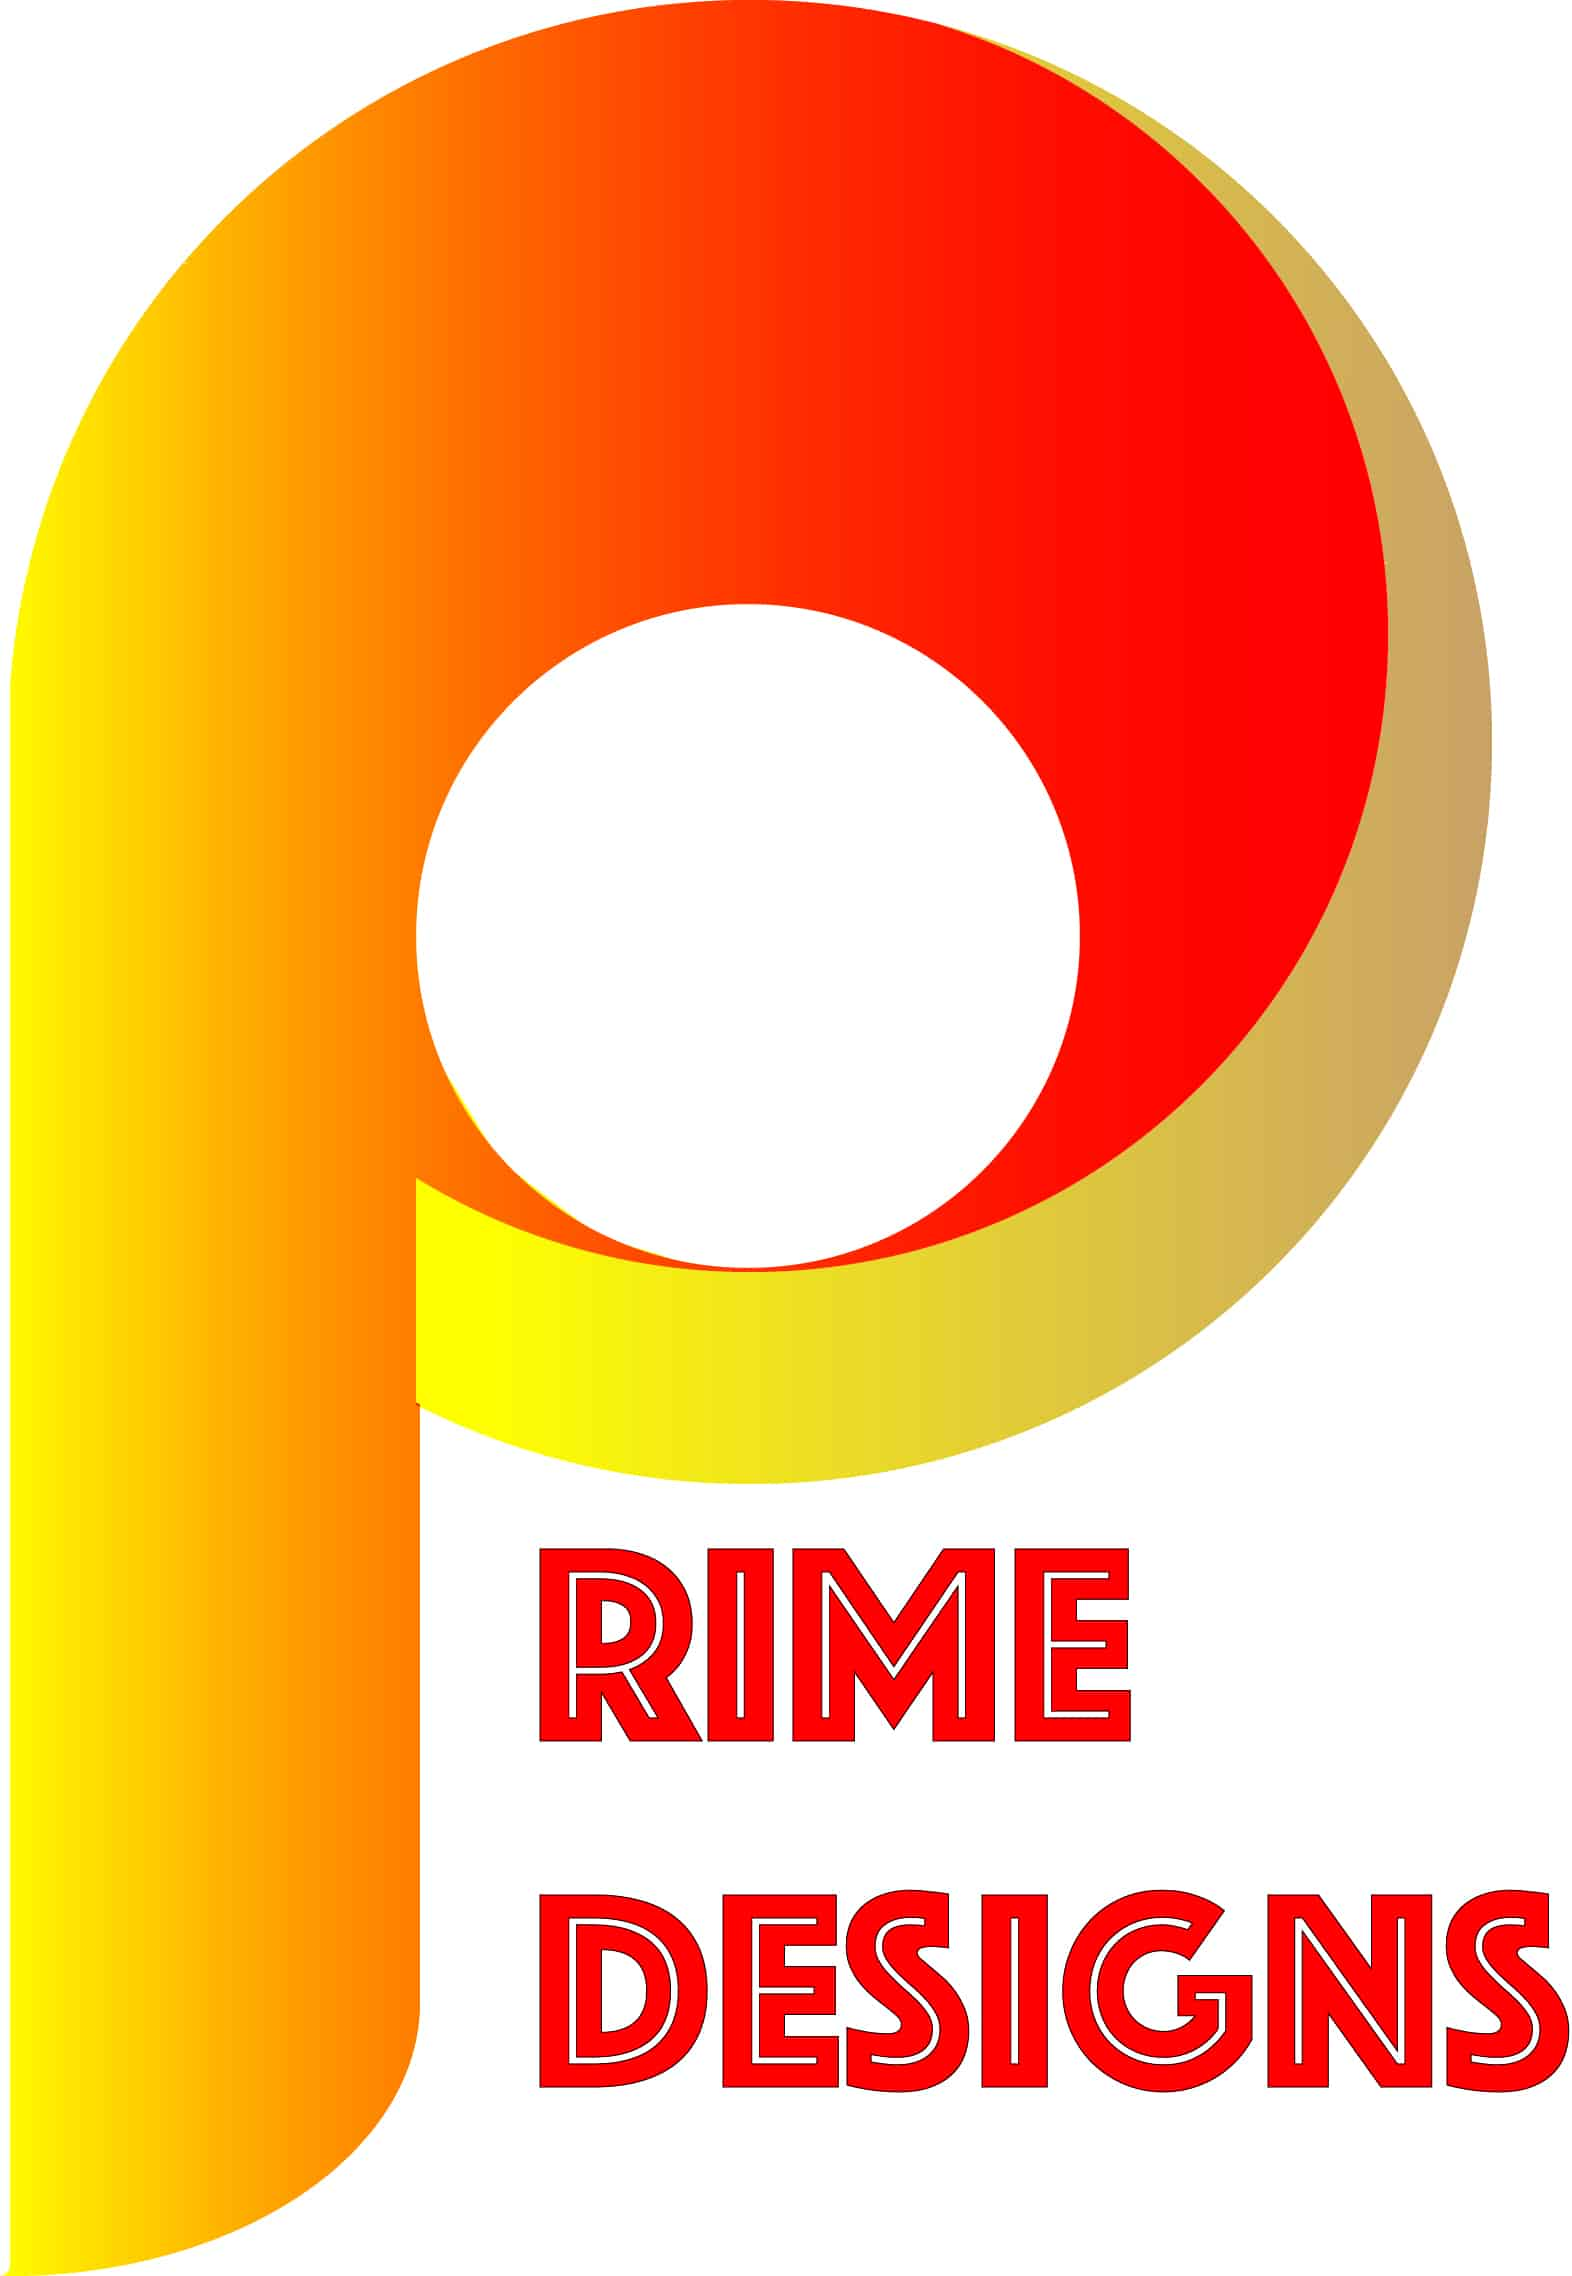 PRIME DESIGNS - HiideeMedia